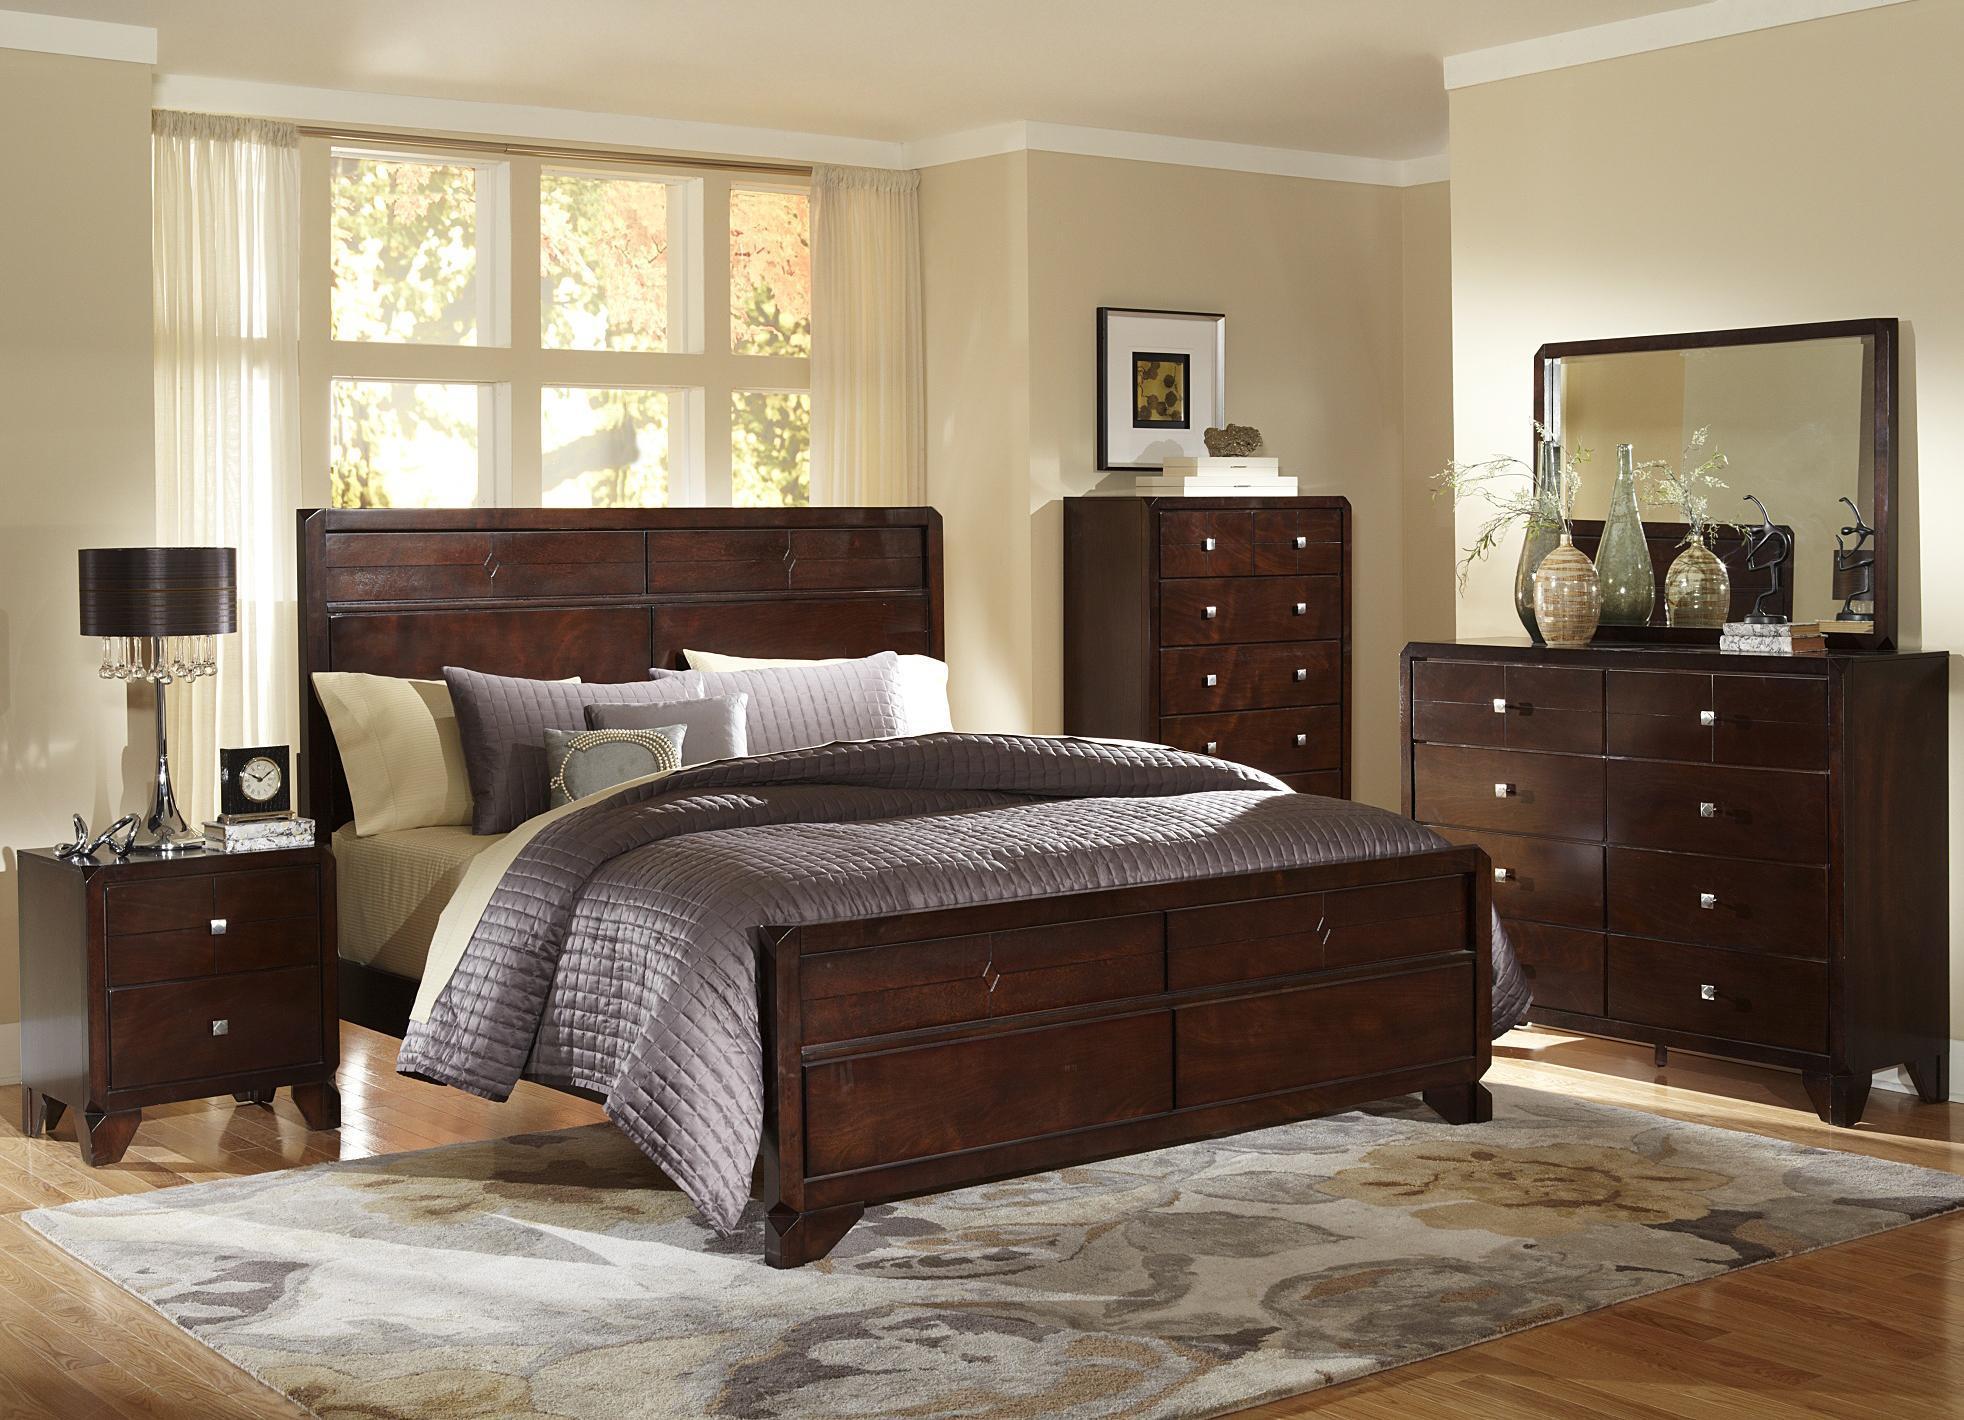 Lifestyle Potbar Queen 4-Piece Bedroom Group - Item Number: 2180 Q Bedroom Group 2